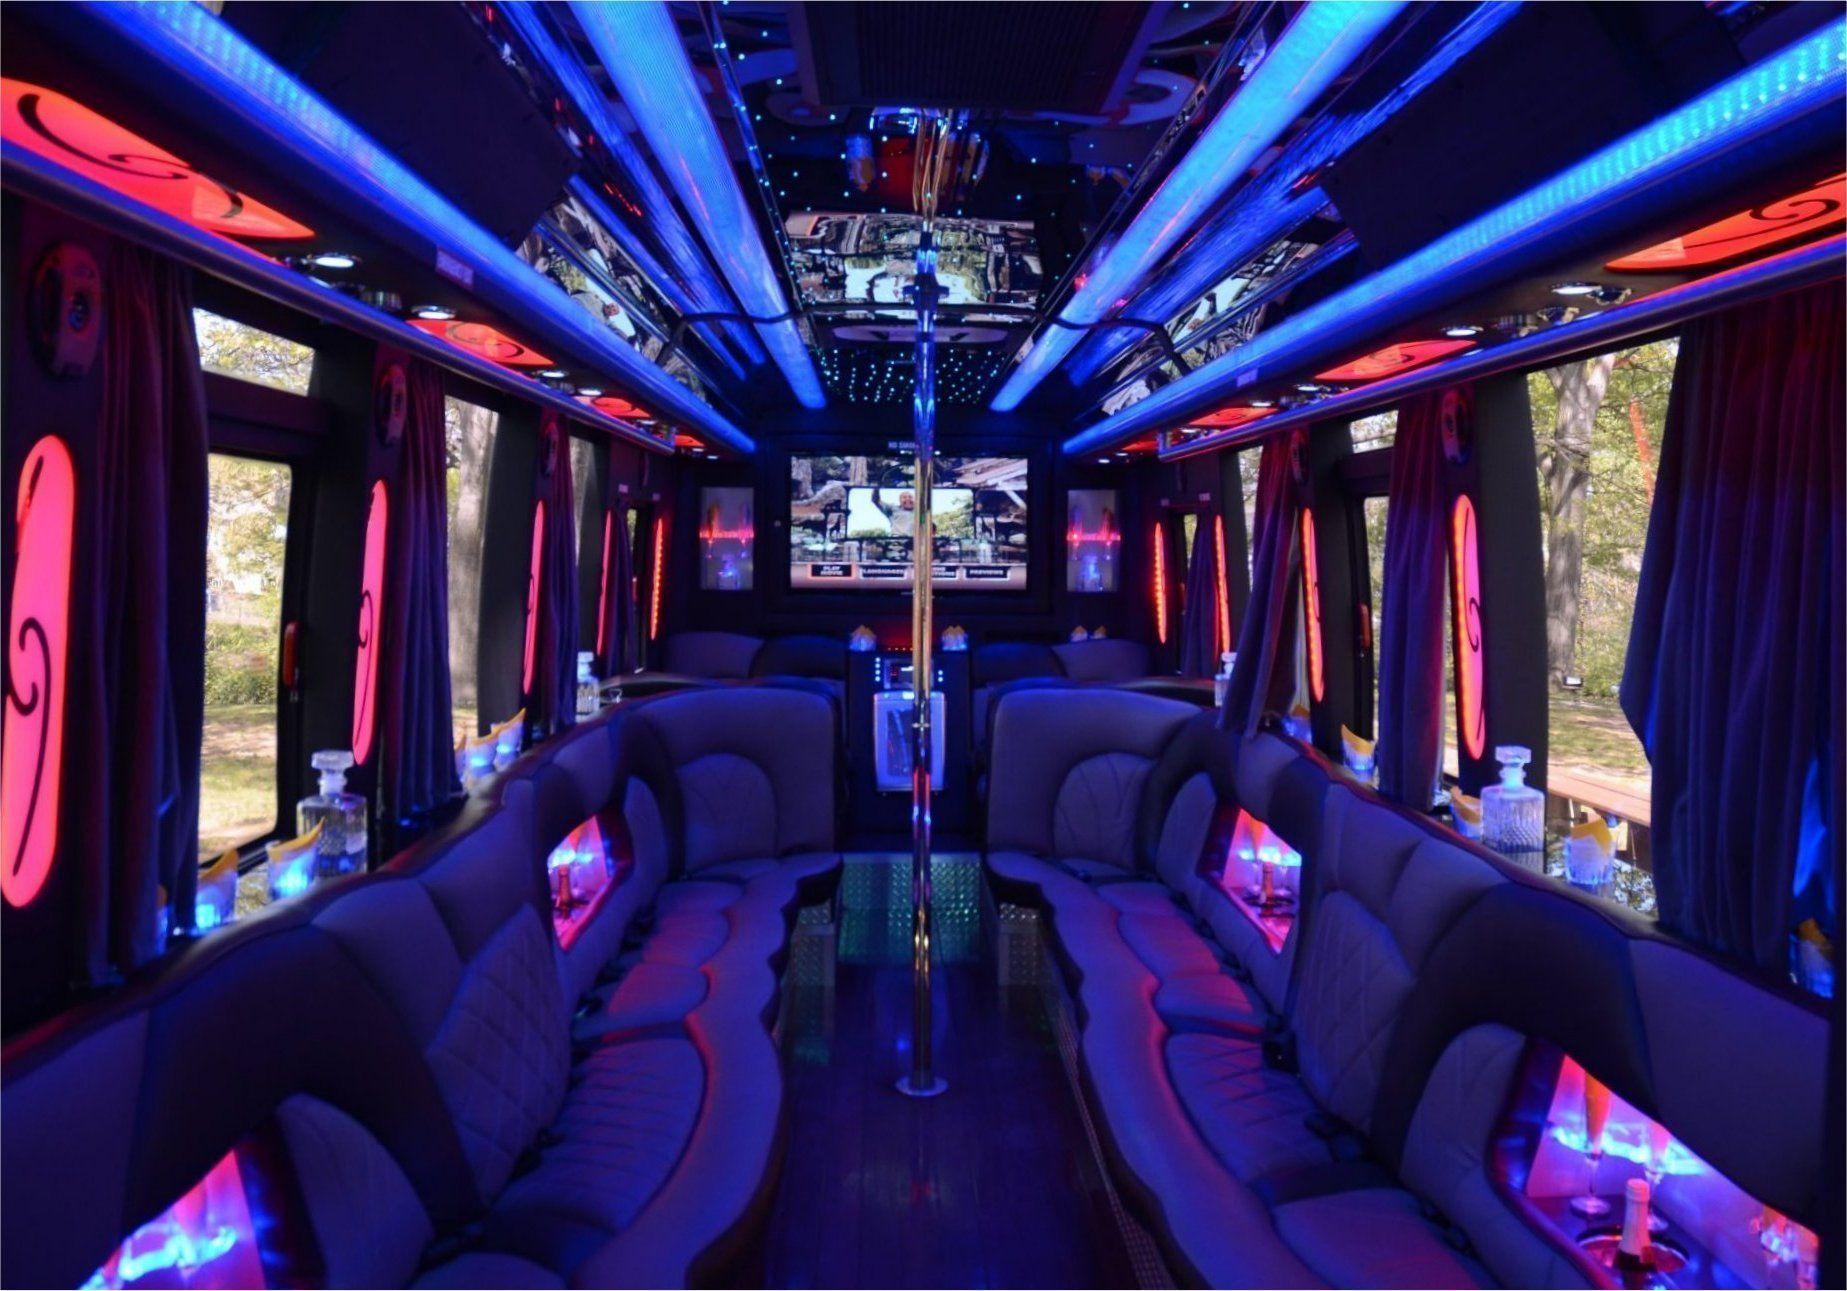 Nj Party Bus Rental Party Bus Rental Limo Party Bus Interior